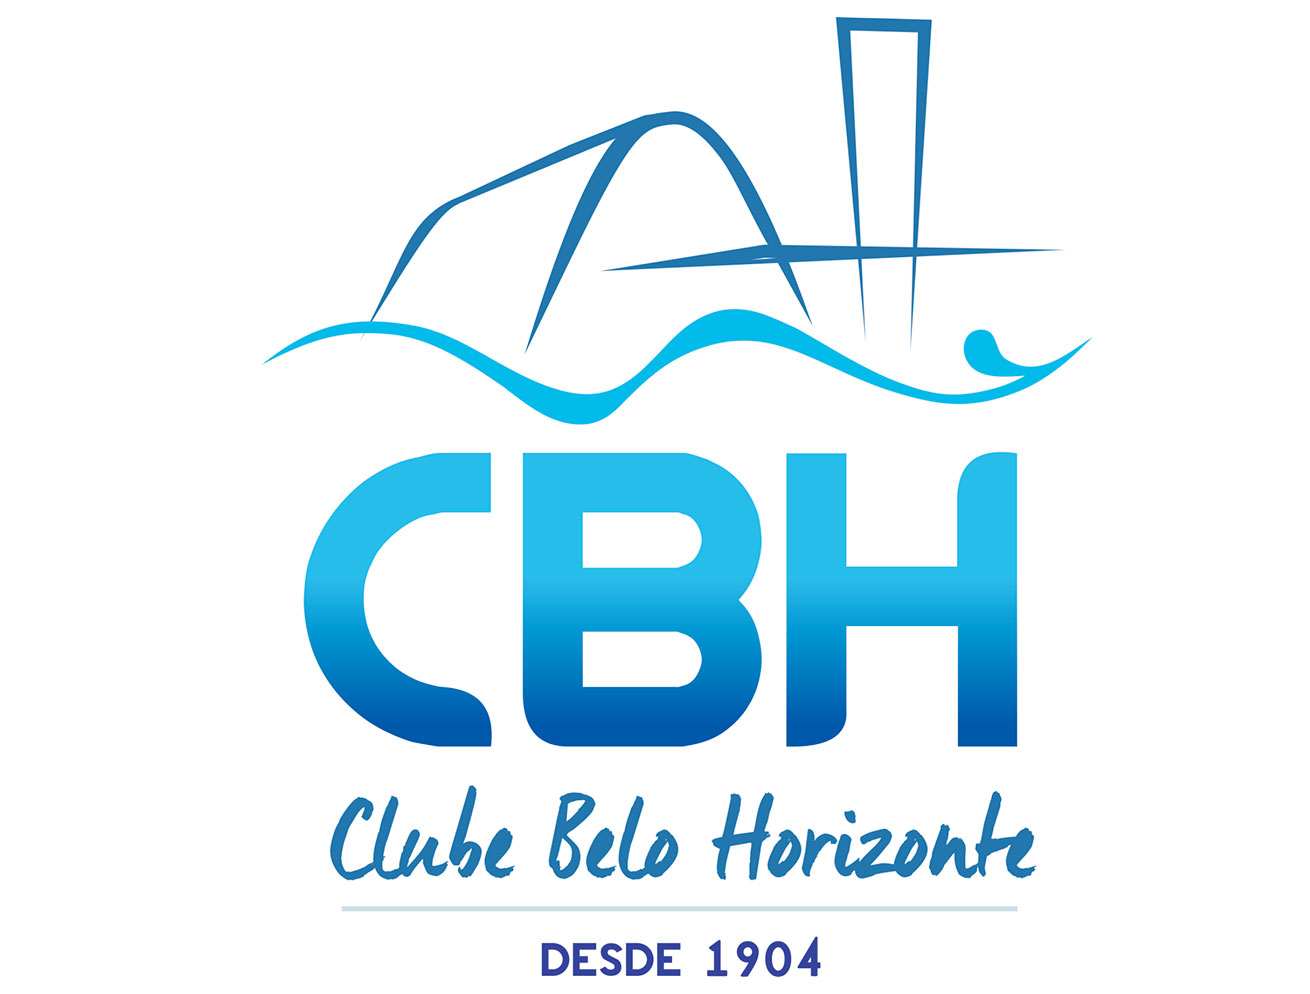 Clube Belo Horizonte